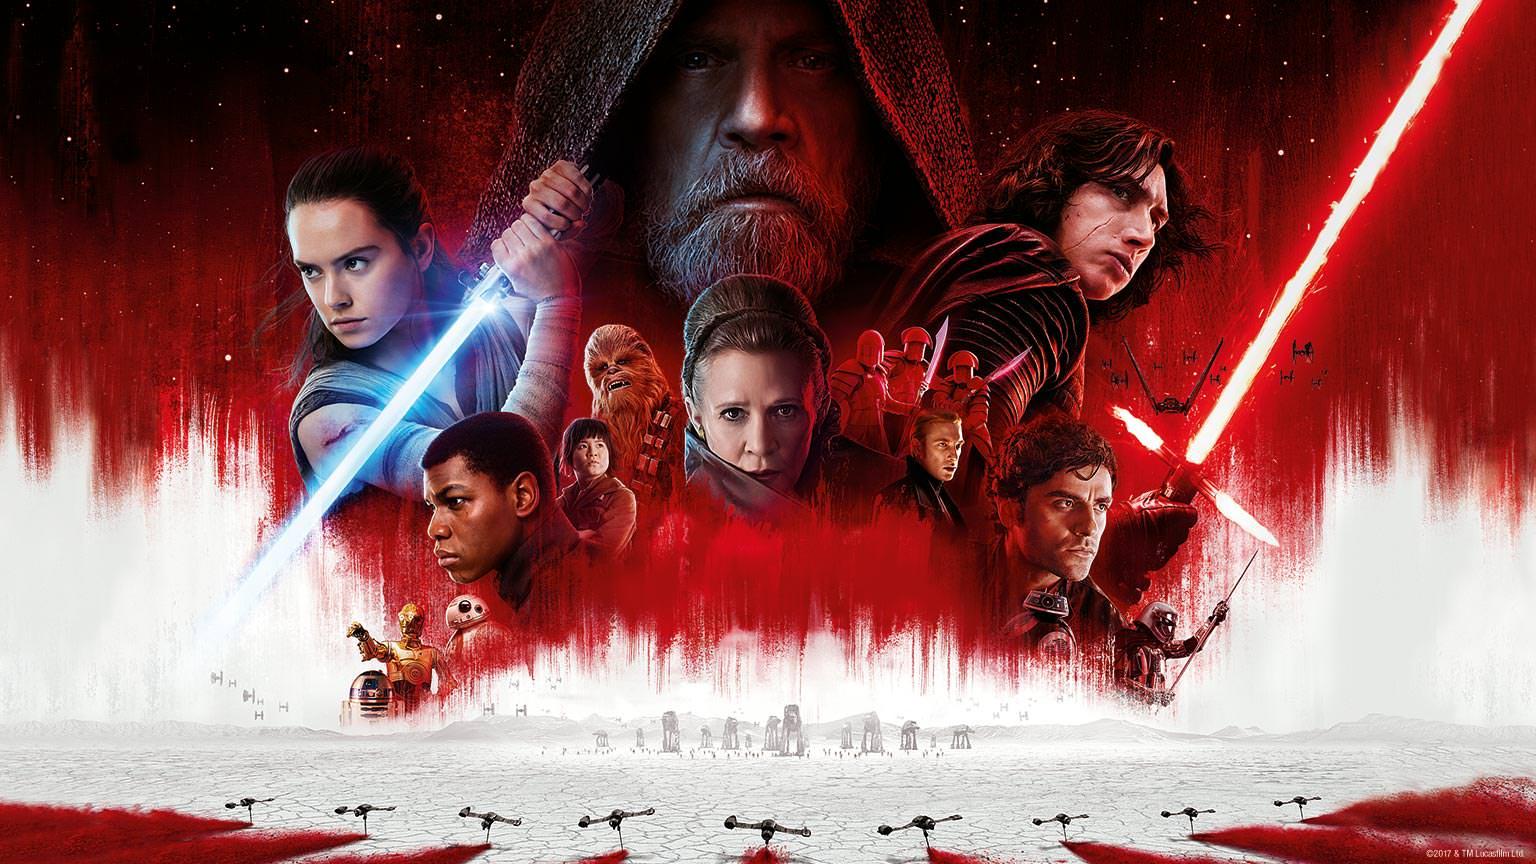 Vojna zvezd: Poslednji jedi (Star Wars: The Last Jedi)